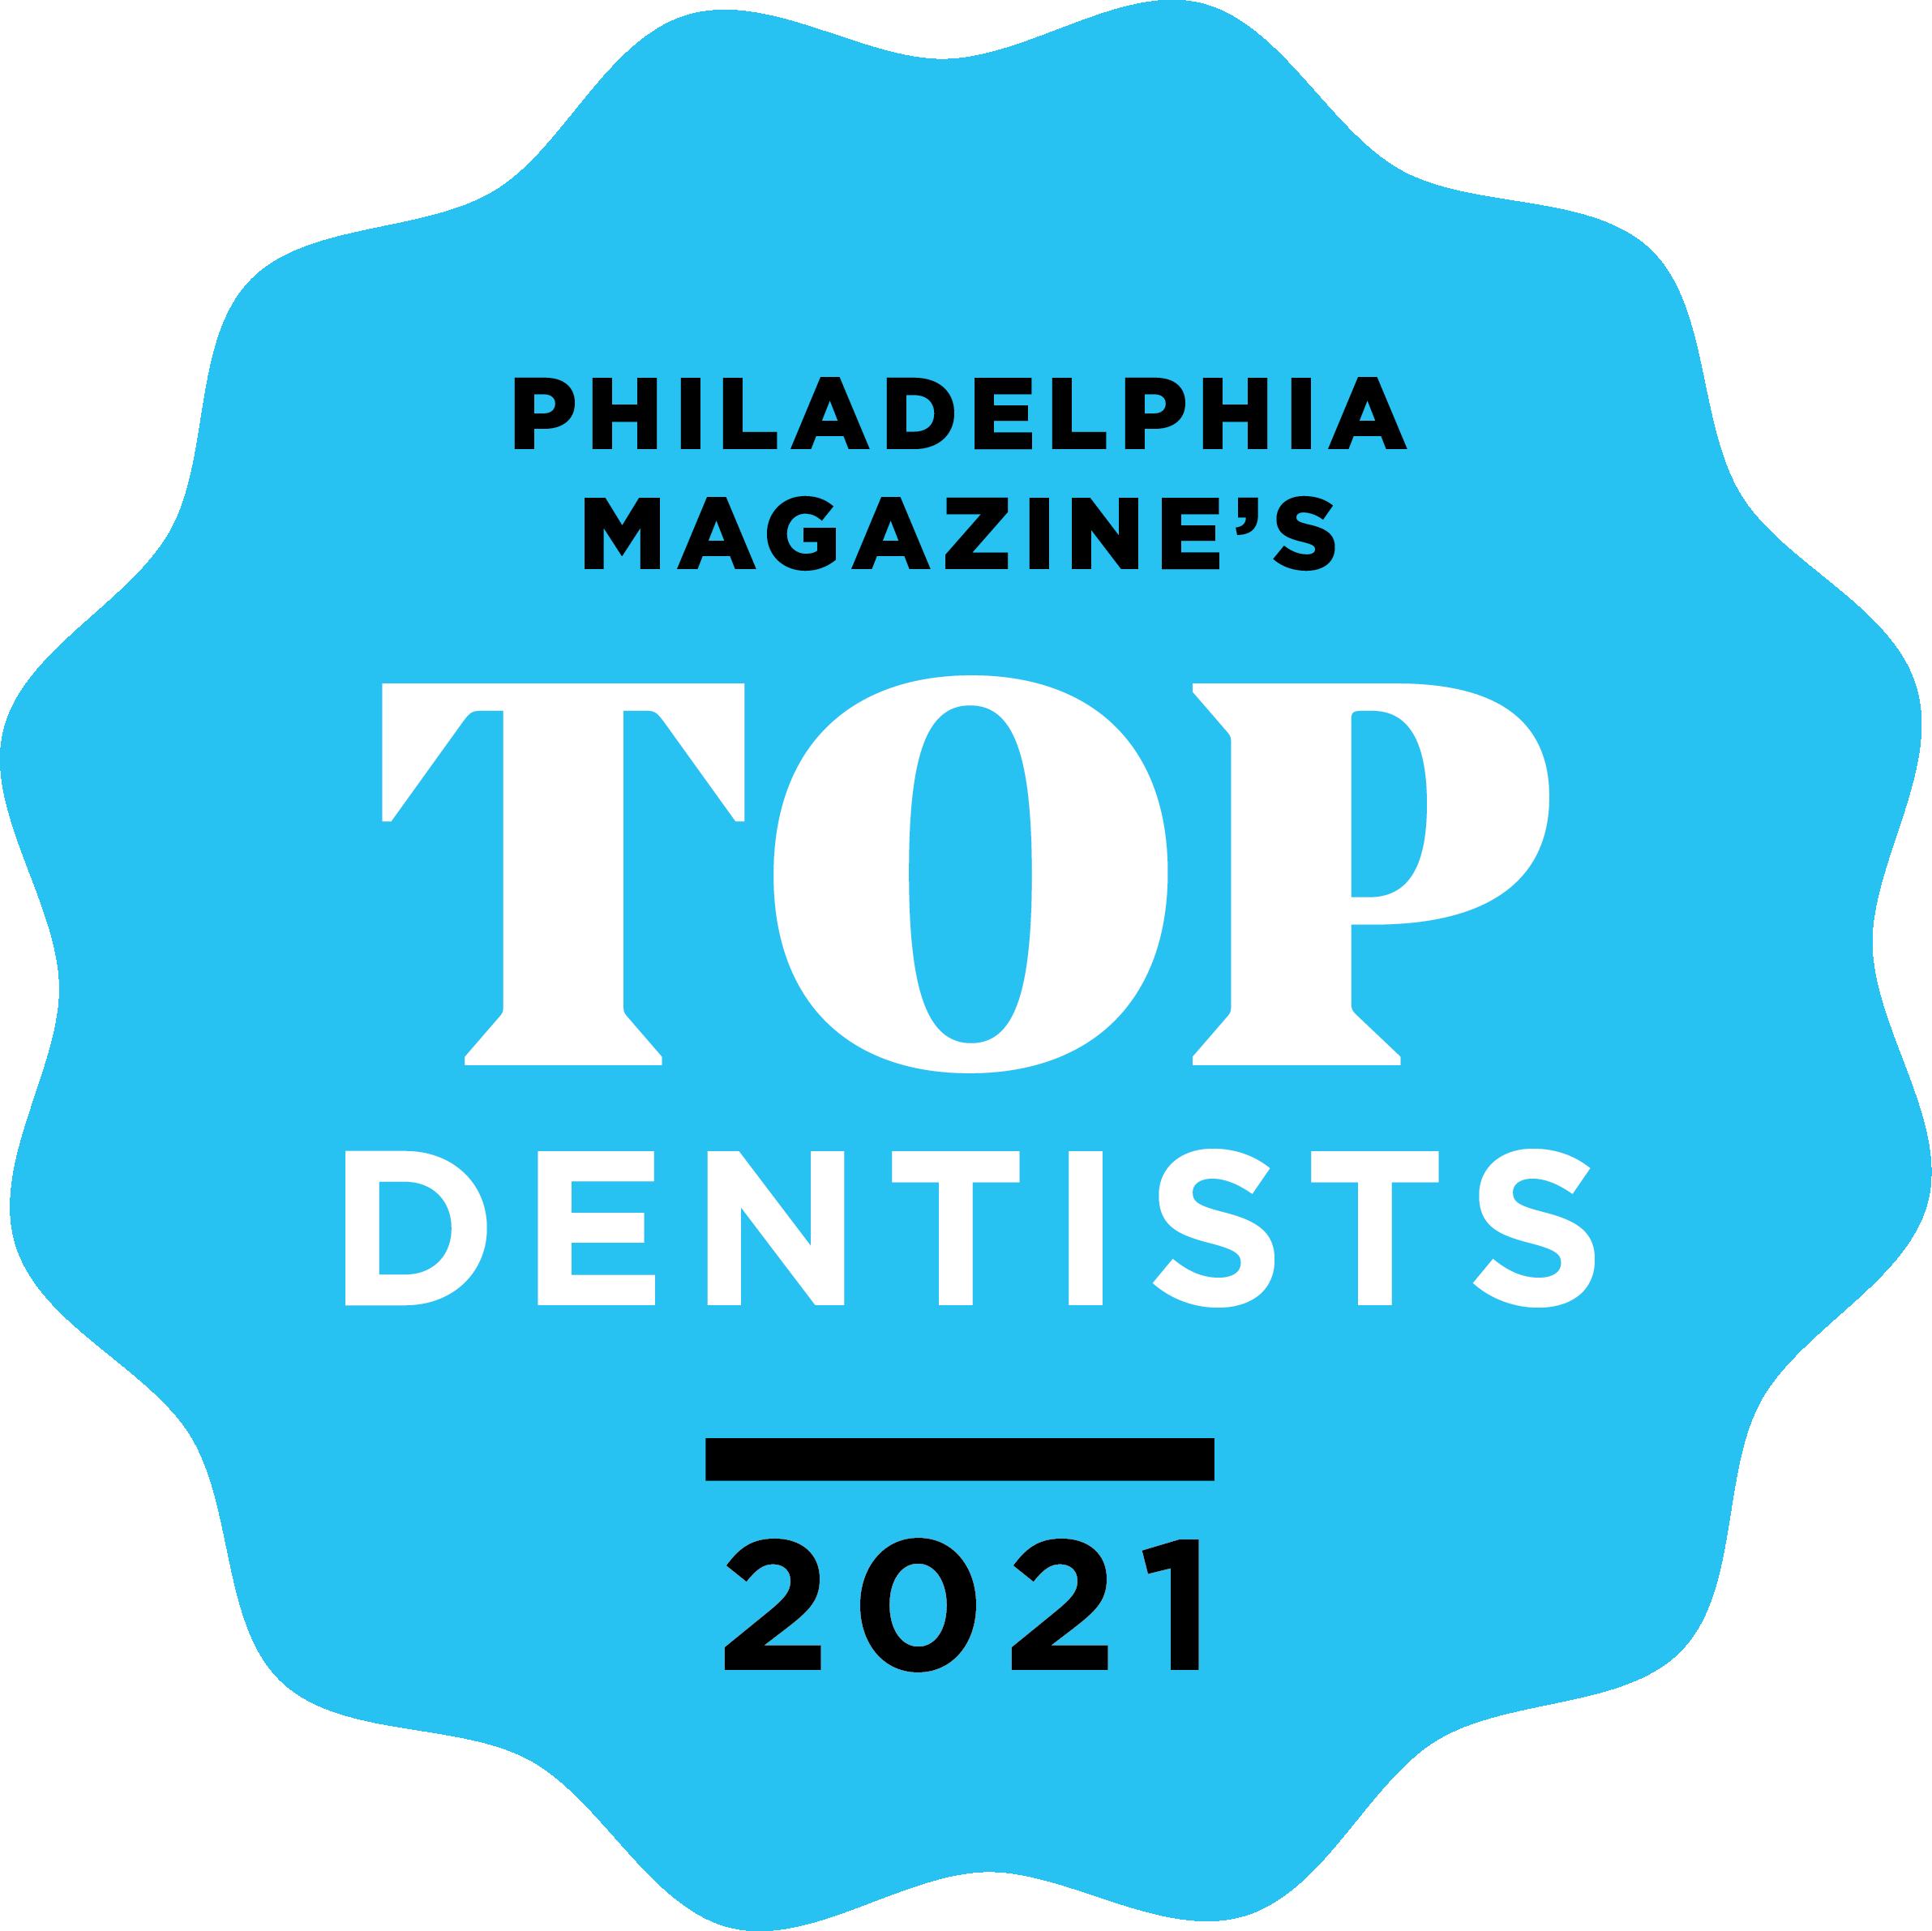 Philadelphia's Top Dentist logo